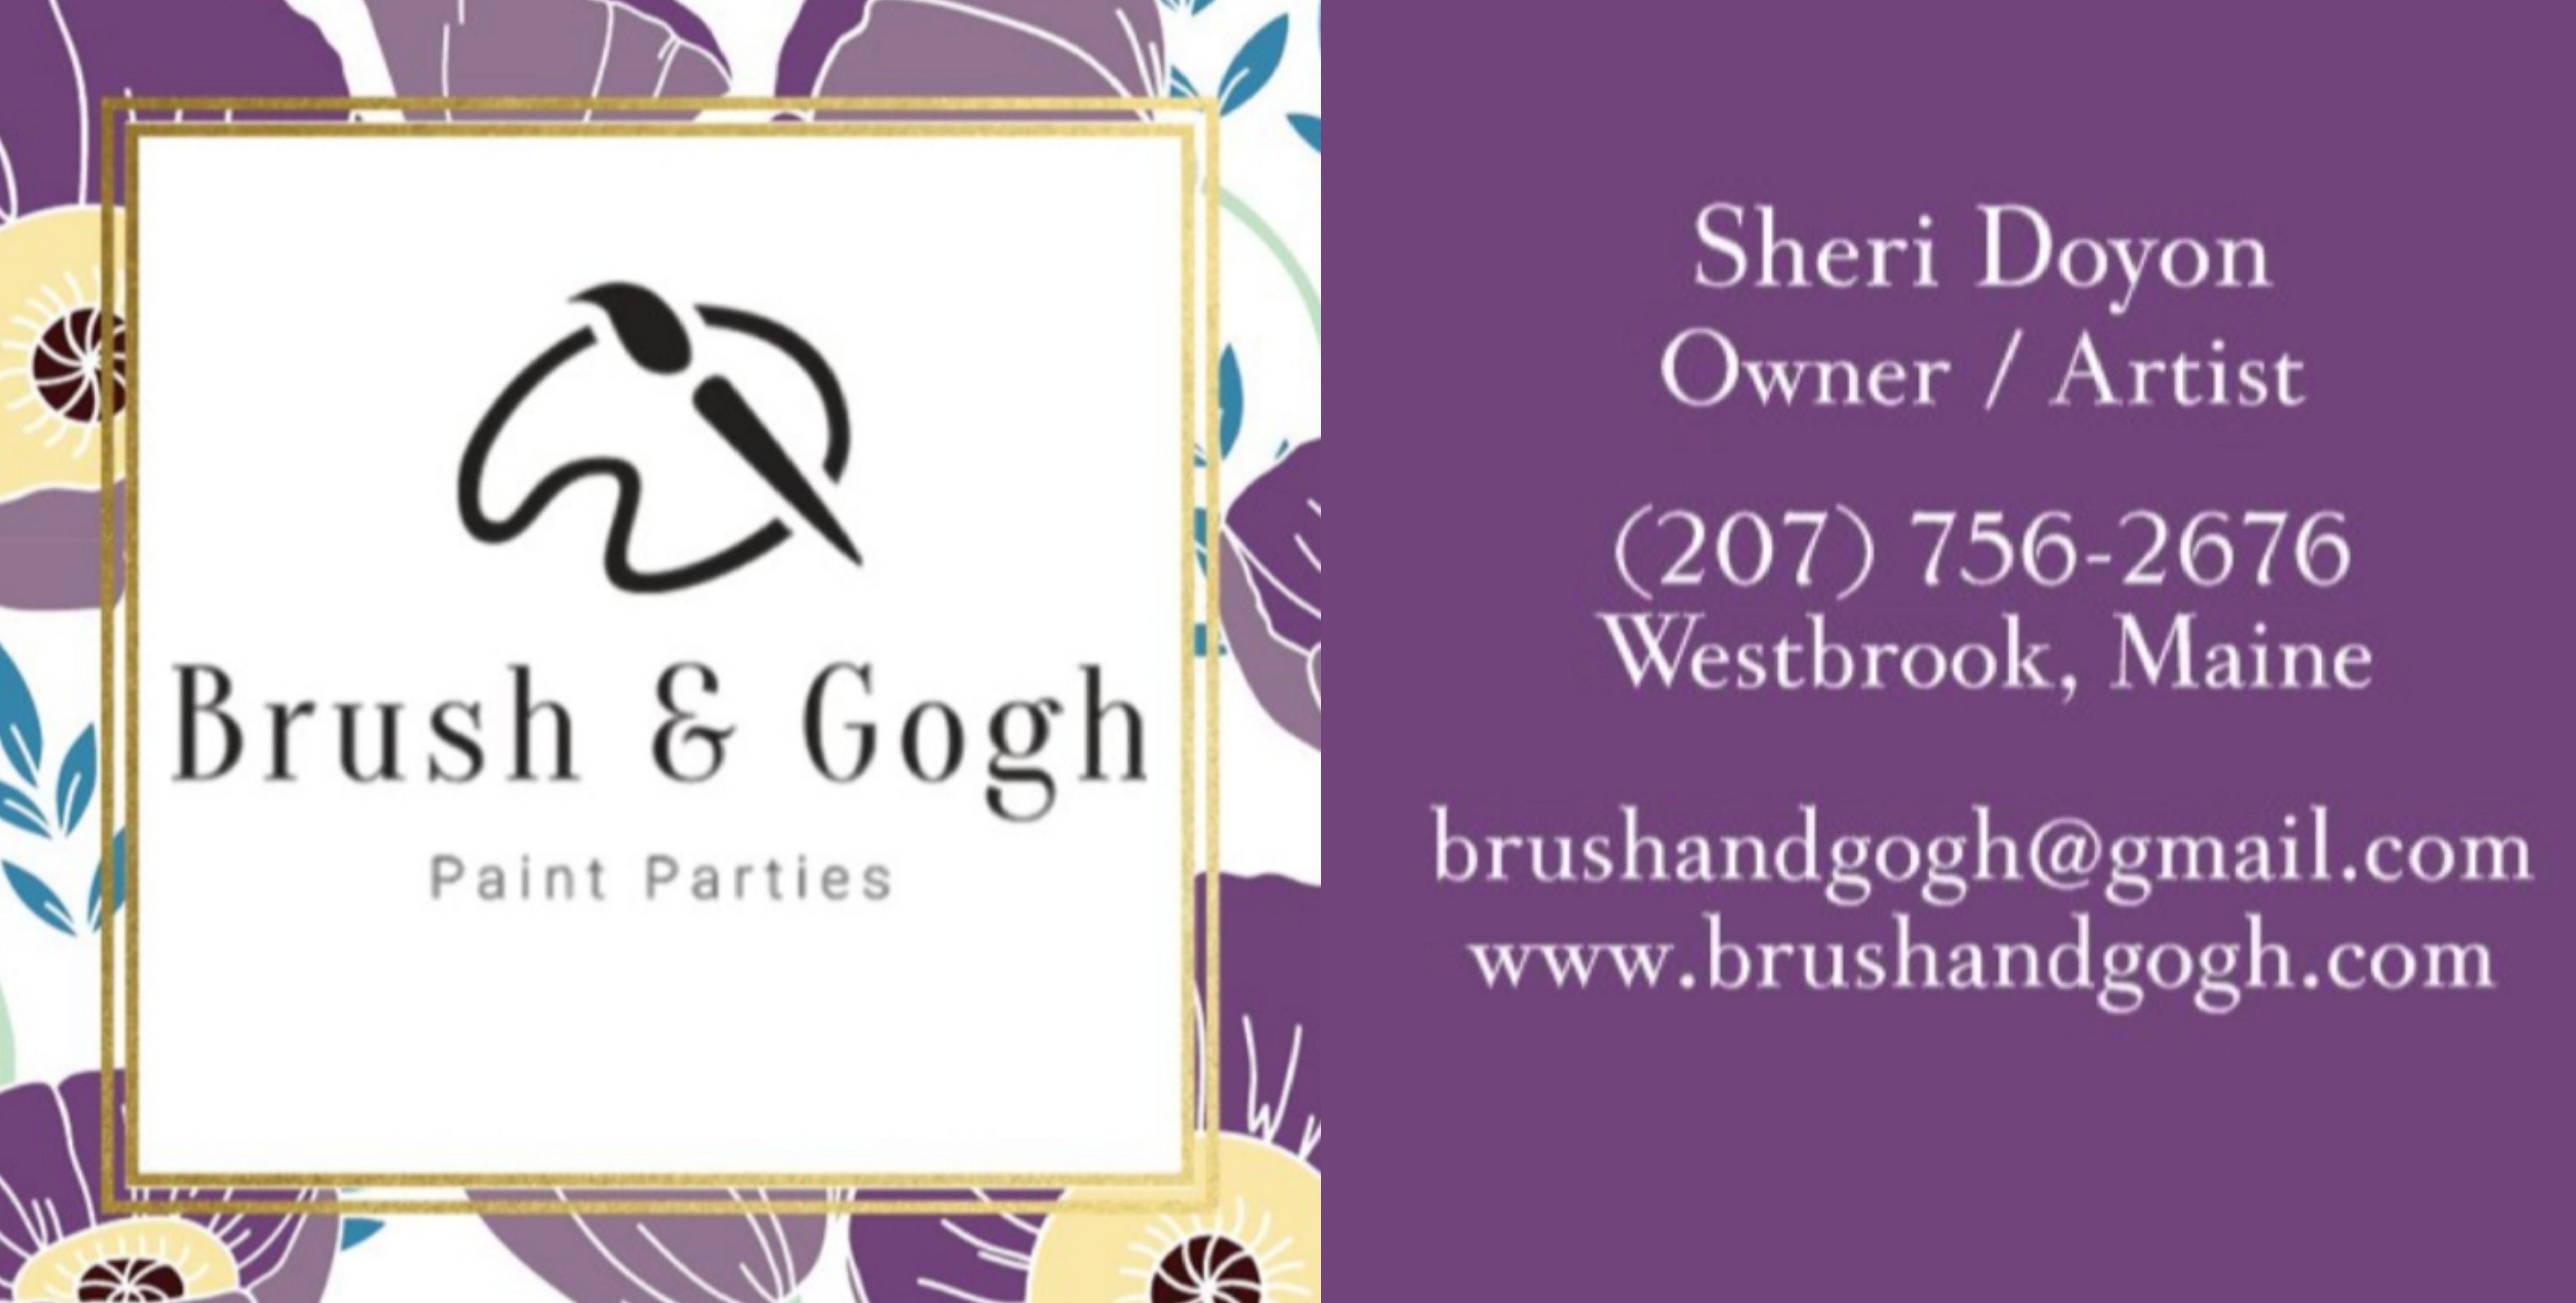 Brush & Gogh